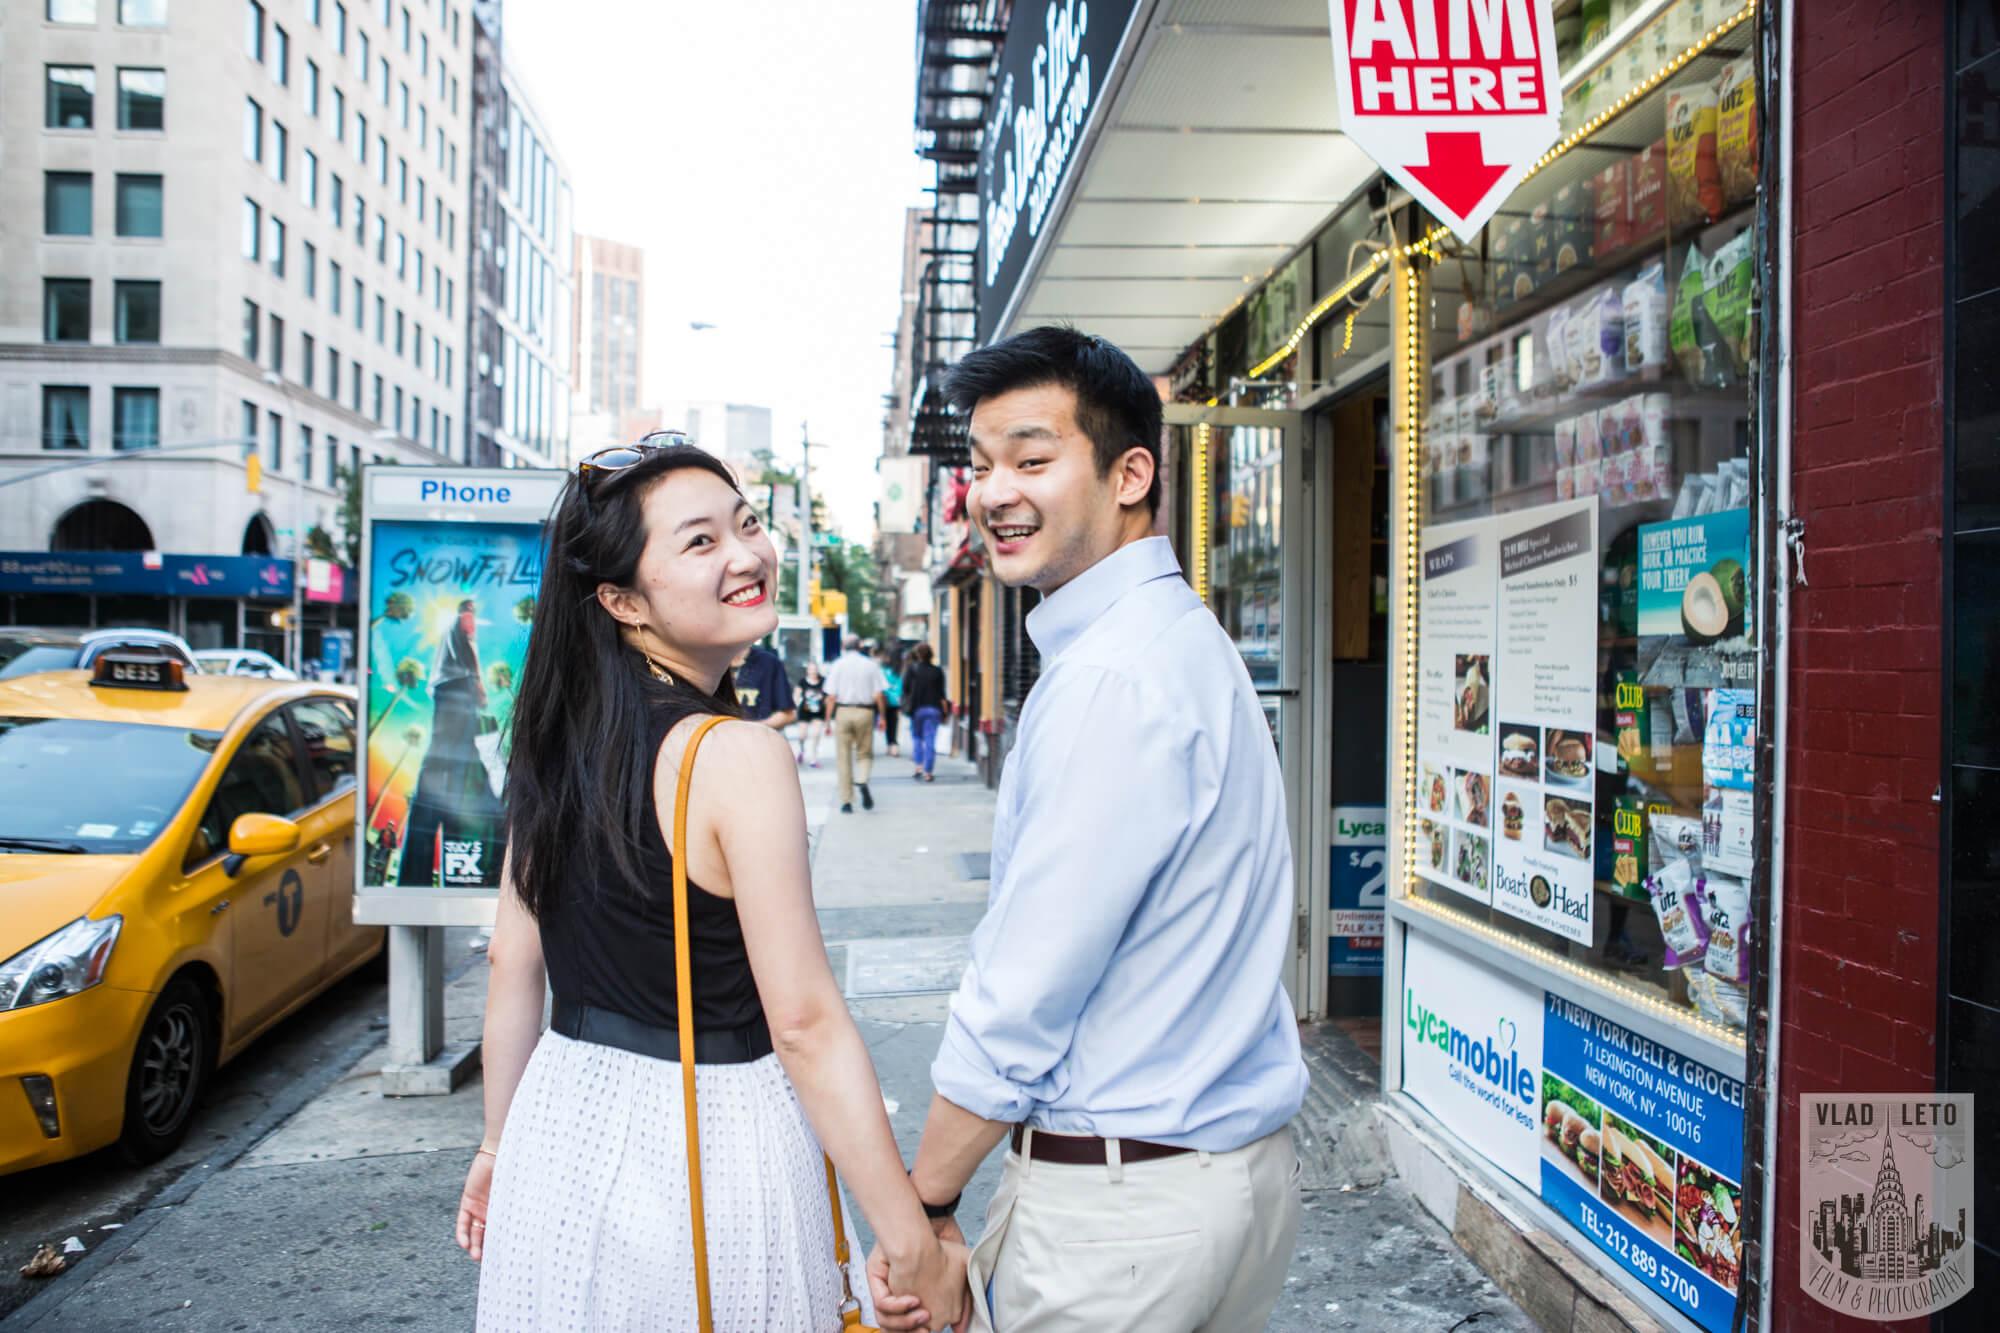 Photo 6 Gramercy Park Marriage Proposal   VladLeto